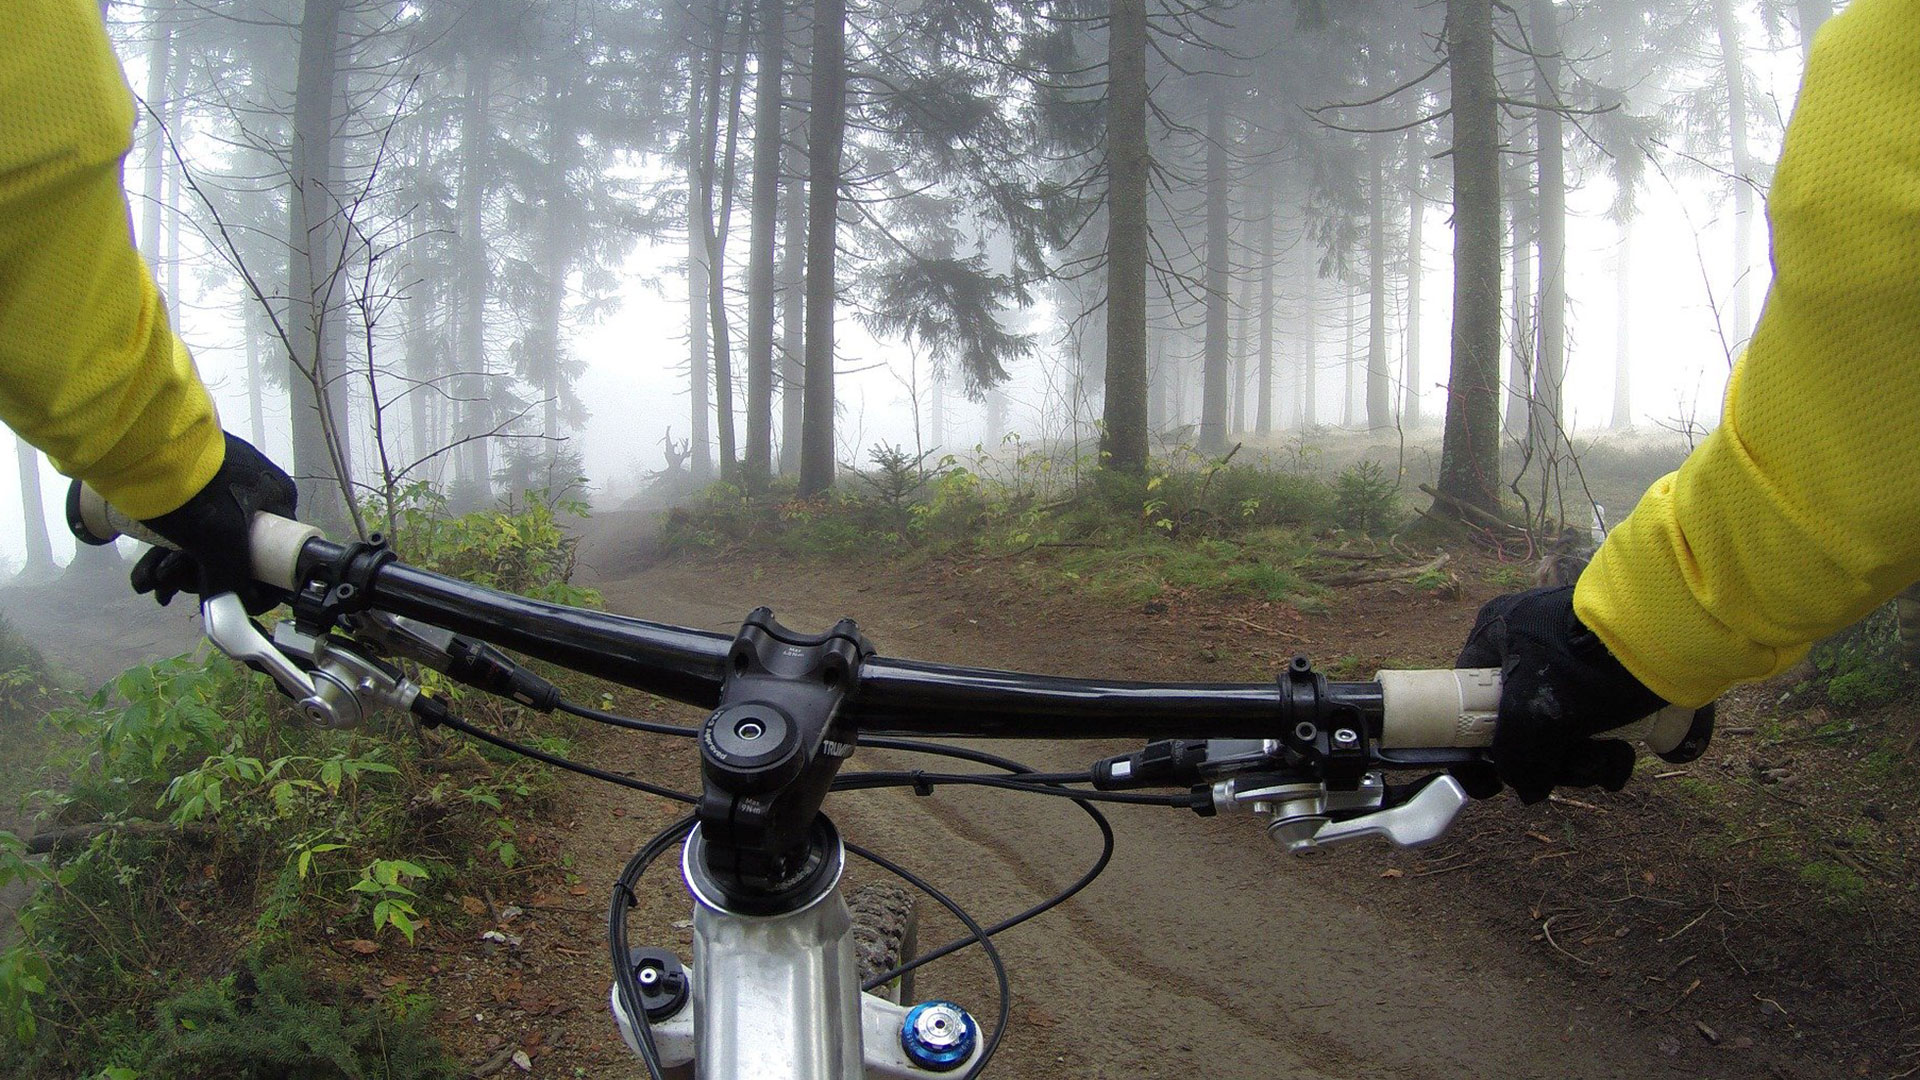 mountainbike_1920x1080